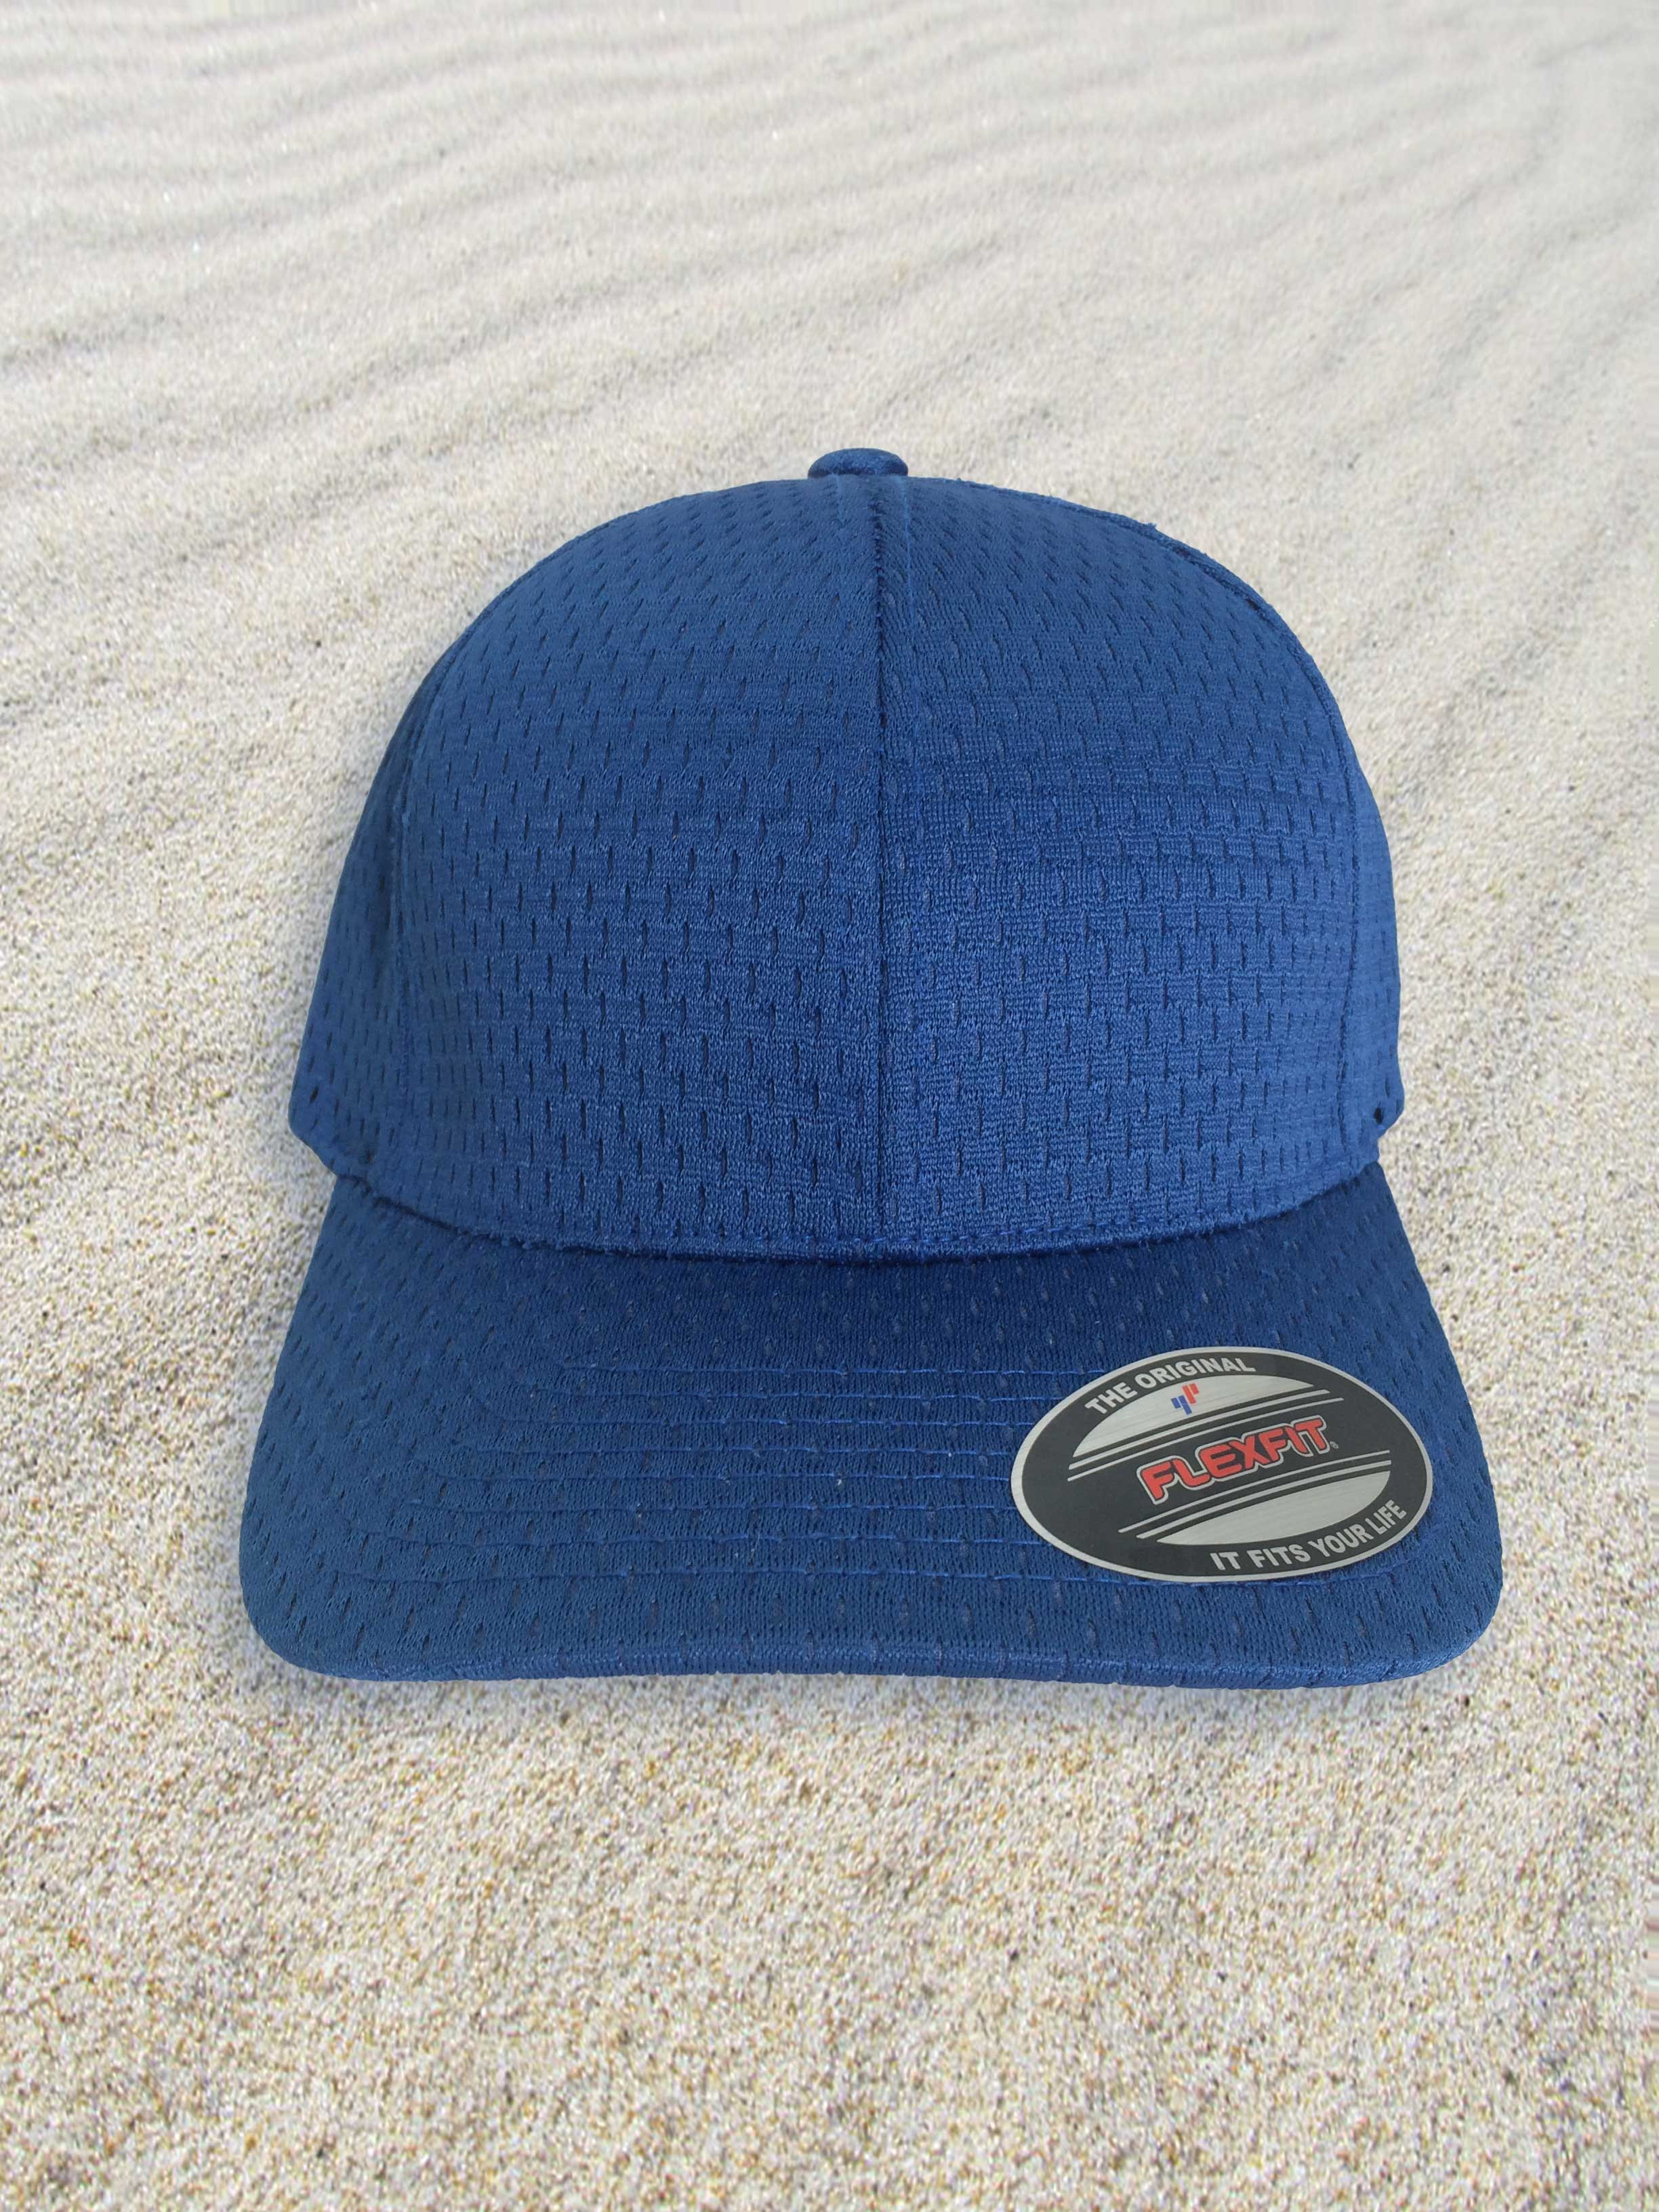 63c119ffd4208 2 Color Mahi Mahi Mesh Flexfit Hat